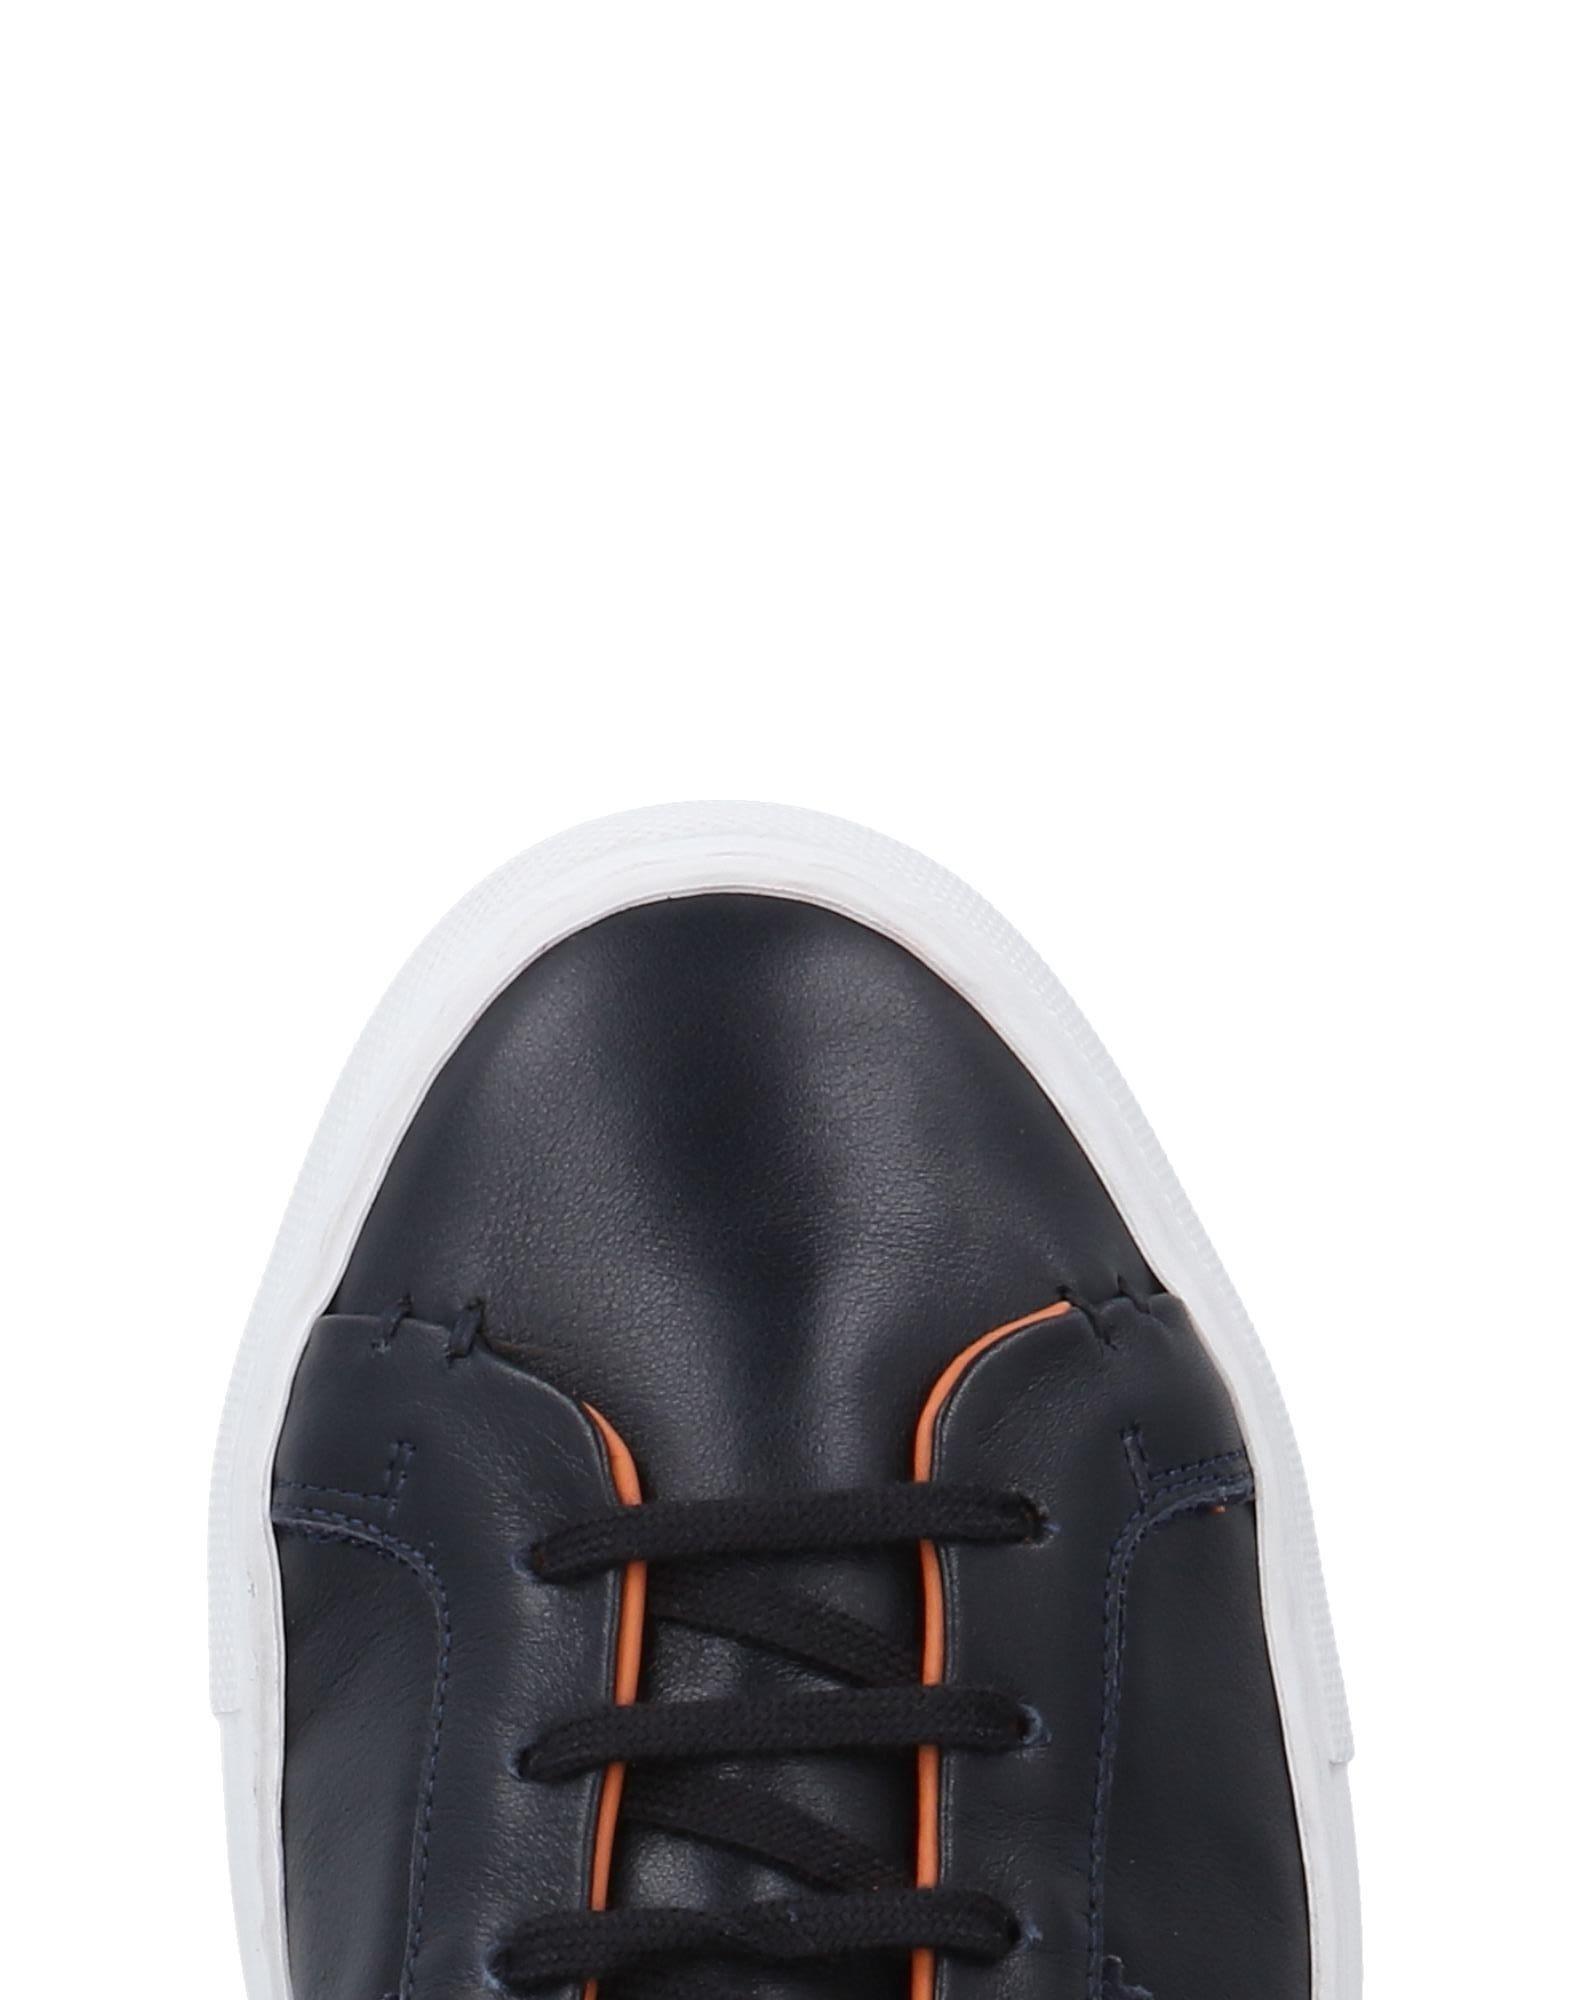 Andrea Ventura 11498014XR Firenze Sneakers Herren  11498014XR Ventura 41d0a0